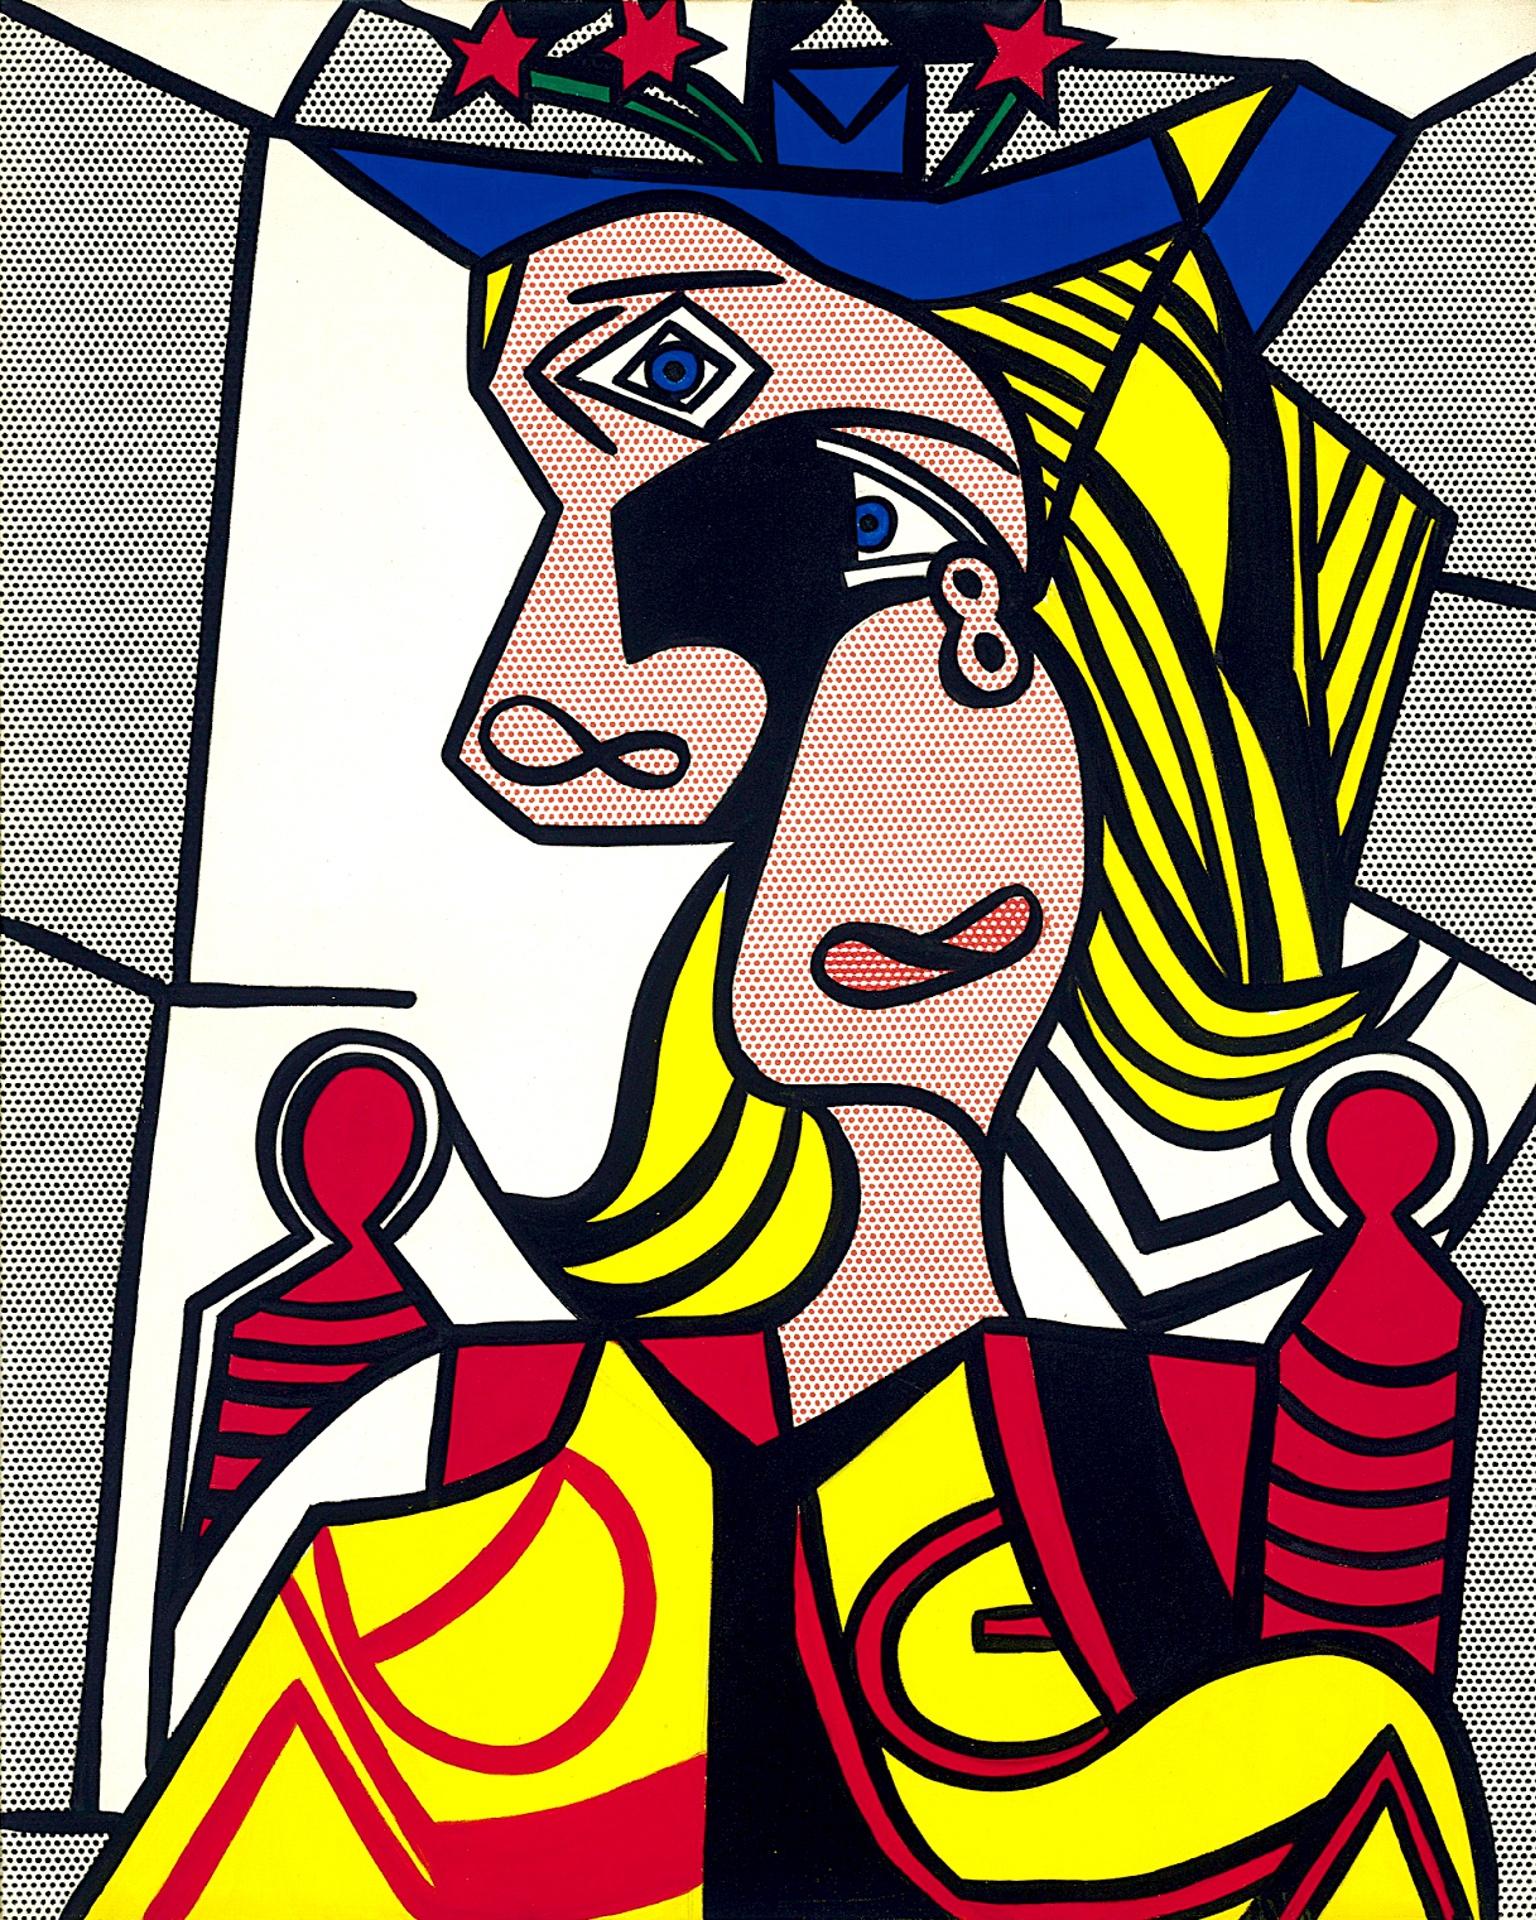 Woman with flowered hat (1963) by Roy Lichtenstein - Pako Campo